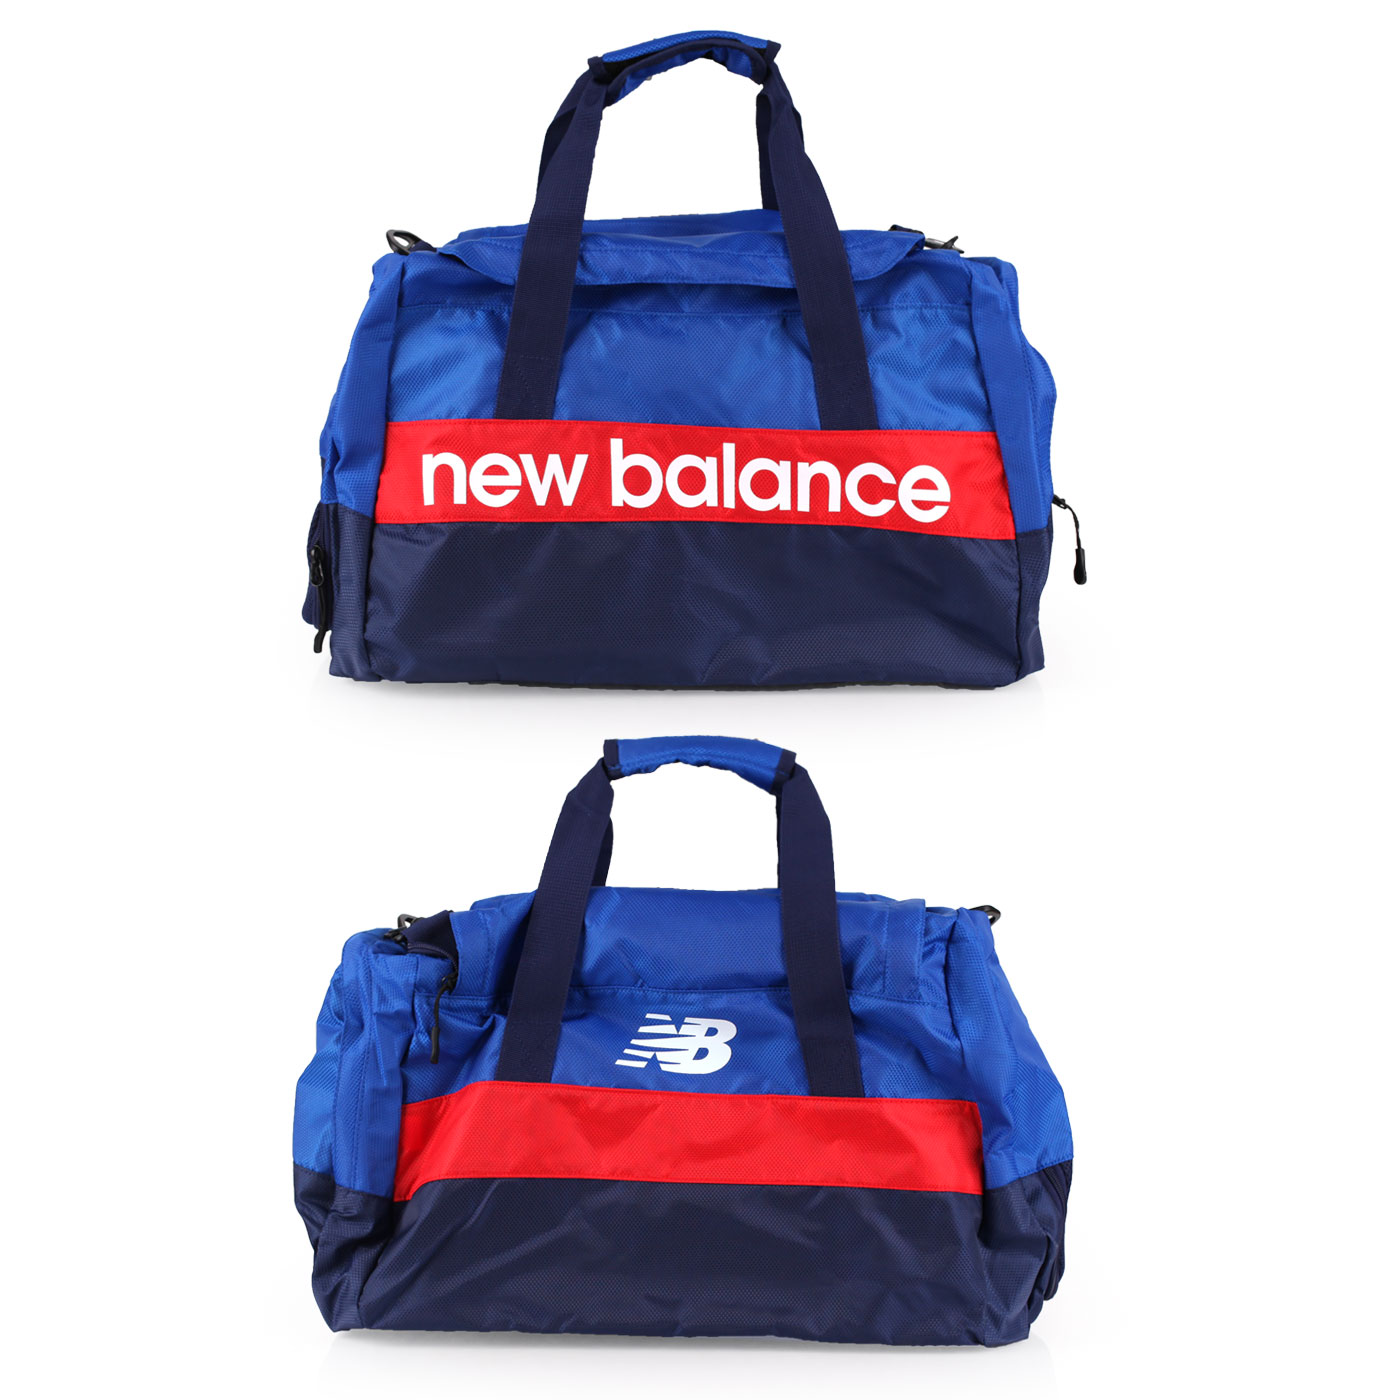 NEW BALANCE 旅行袋 (側背包 斜背包 行李包 NB【05481164】≡排汗專家≡